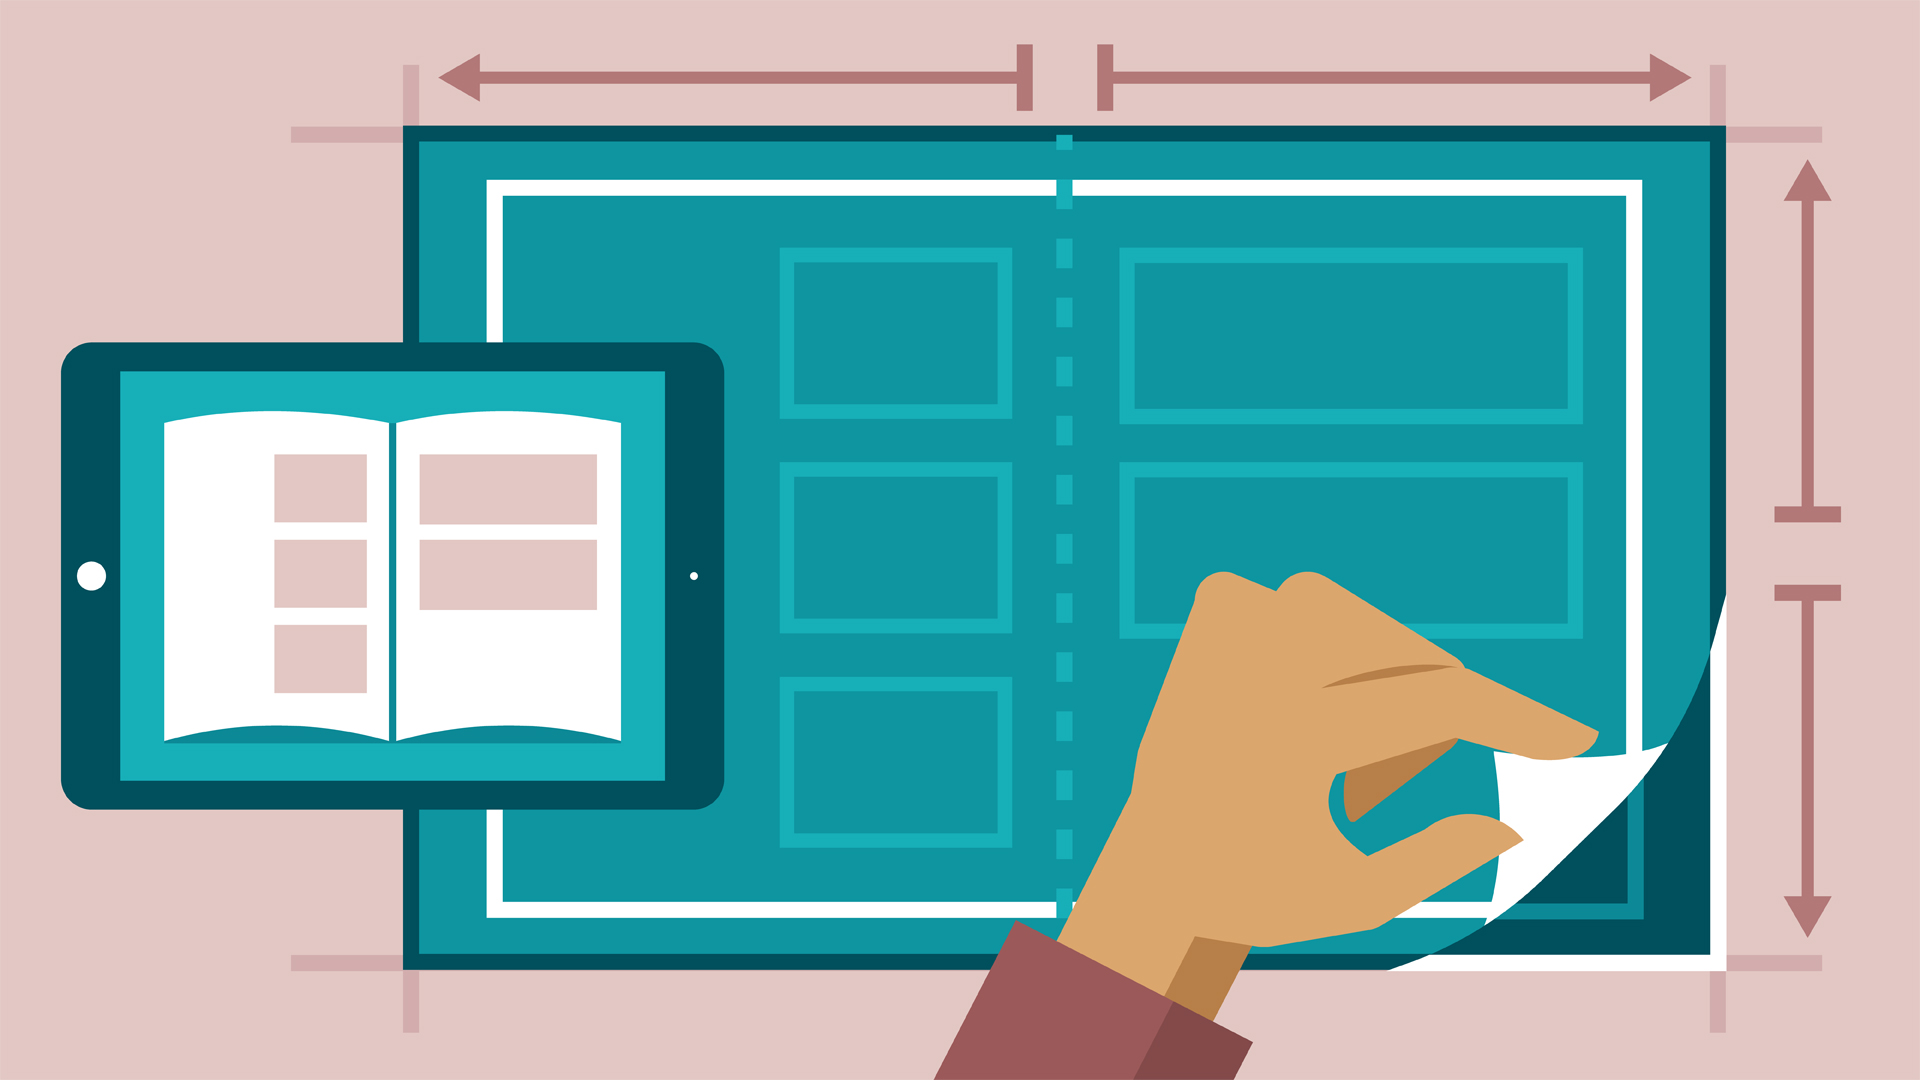 Adobe  Training and Certification  Illustrator training